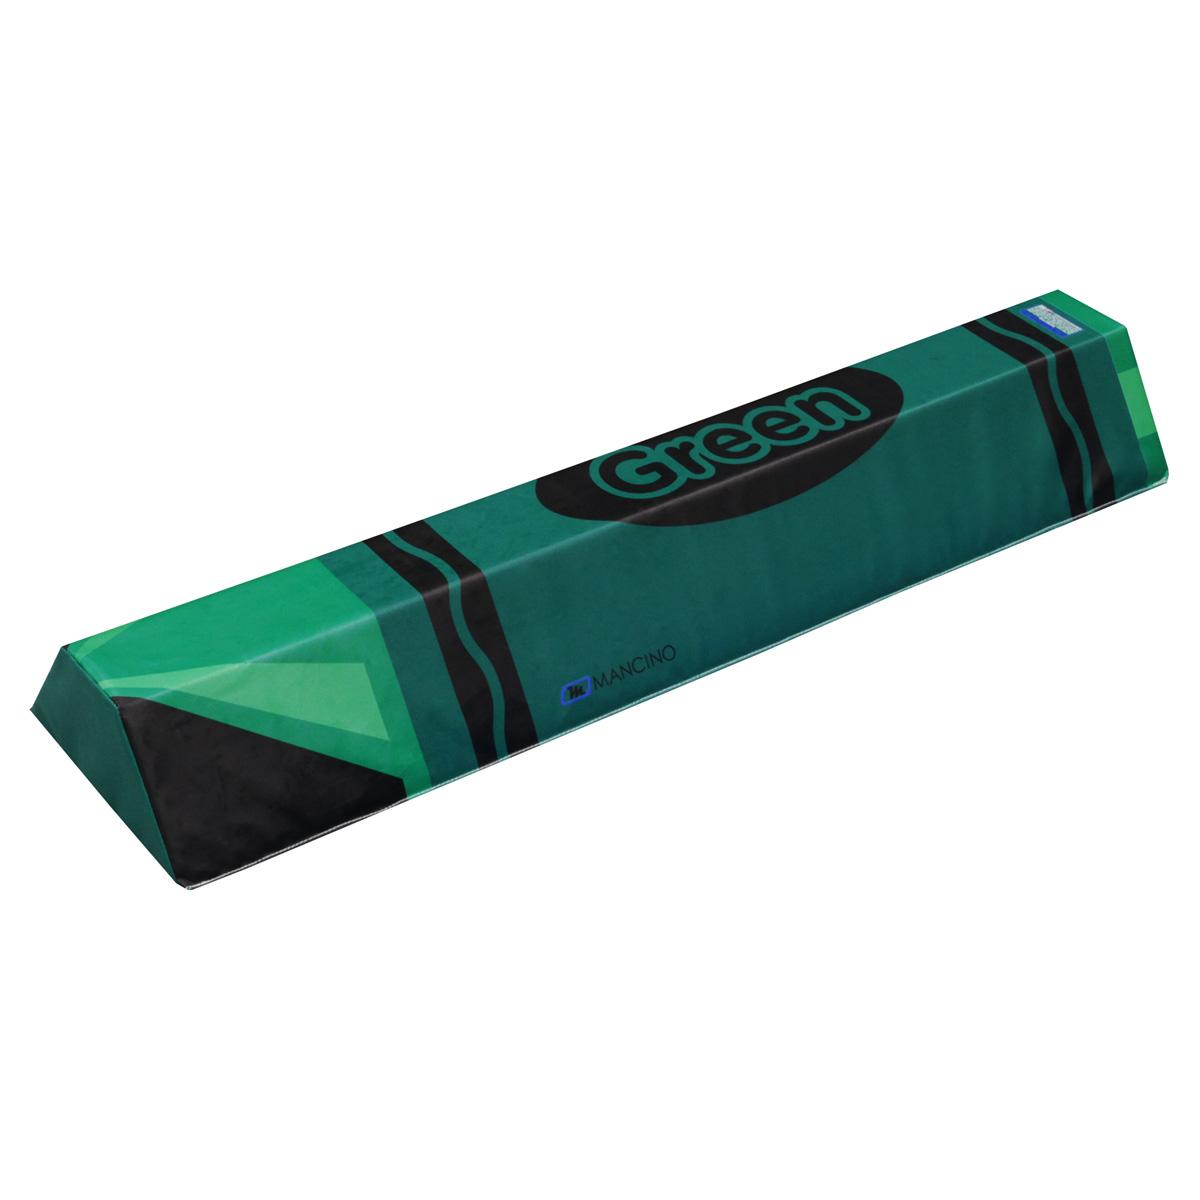 long green crayon climbing mat - mancino mats